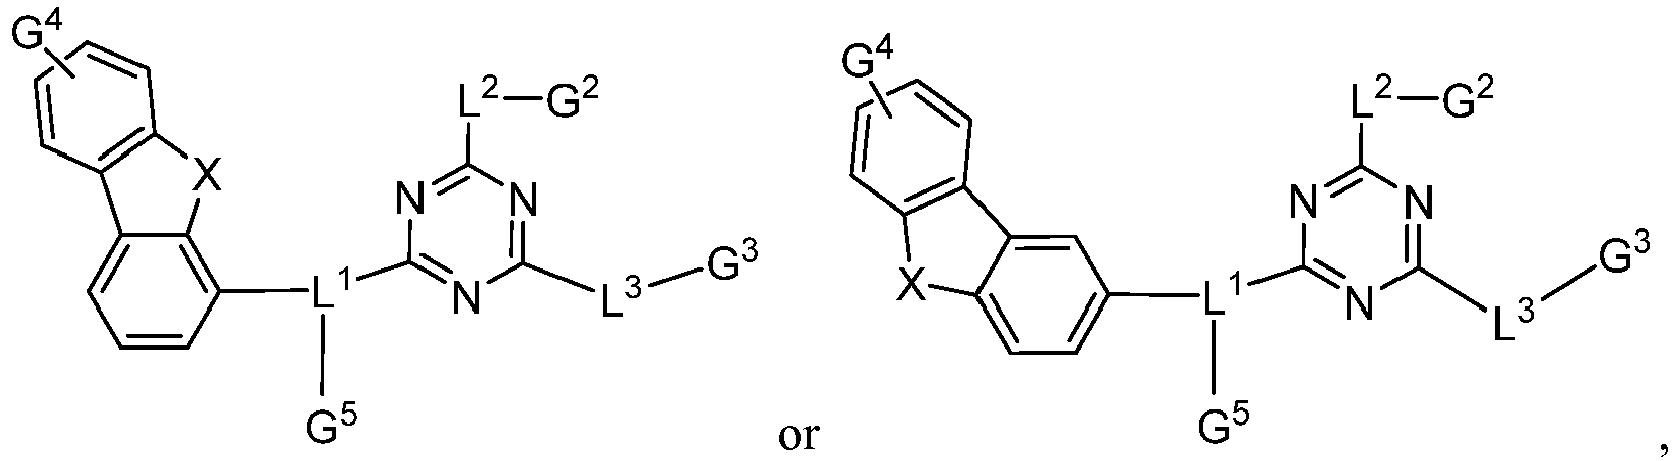 Figure imgb0434